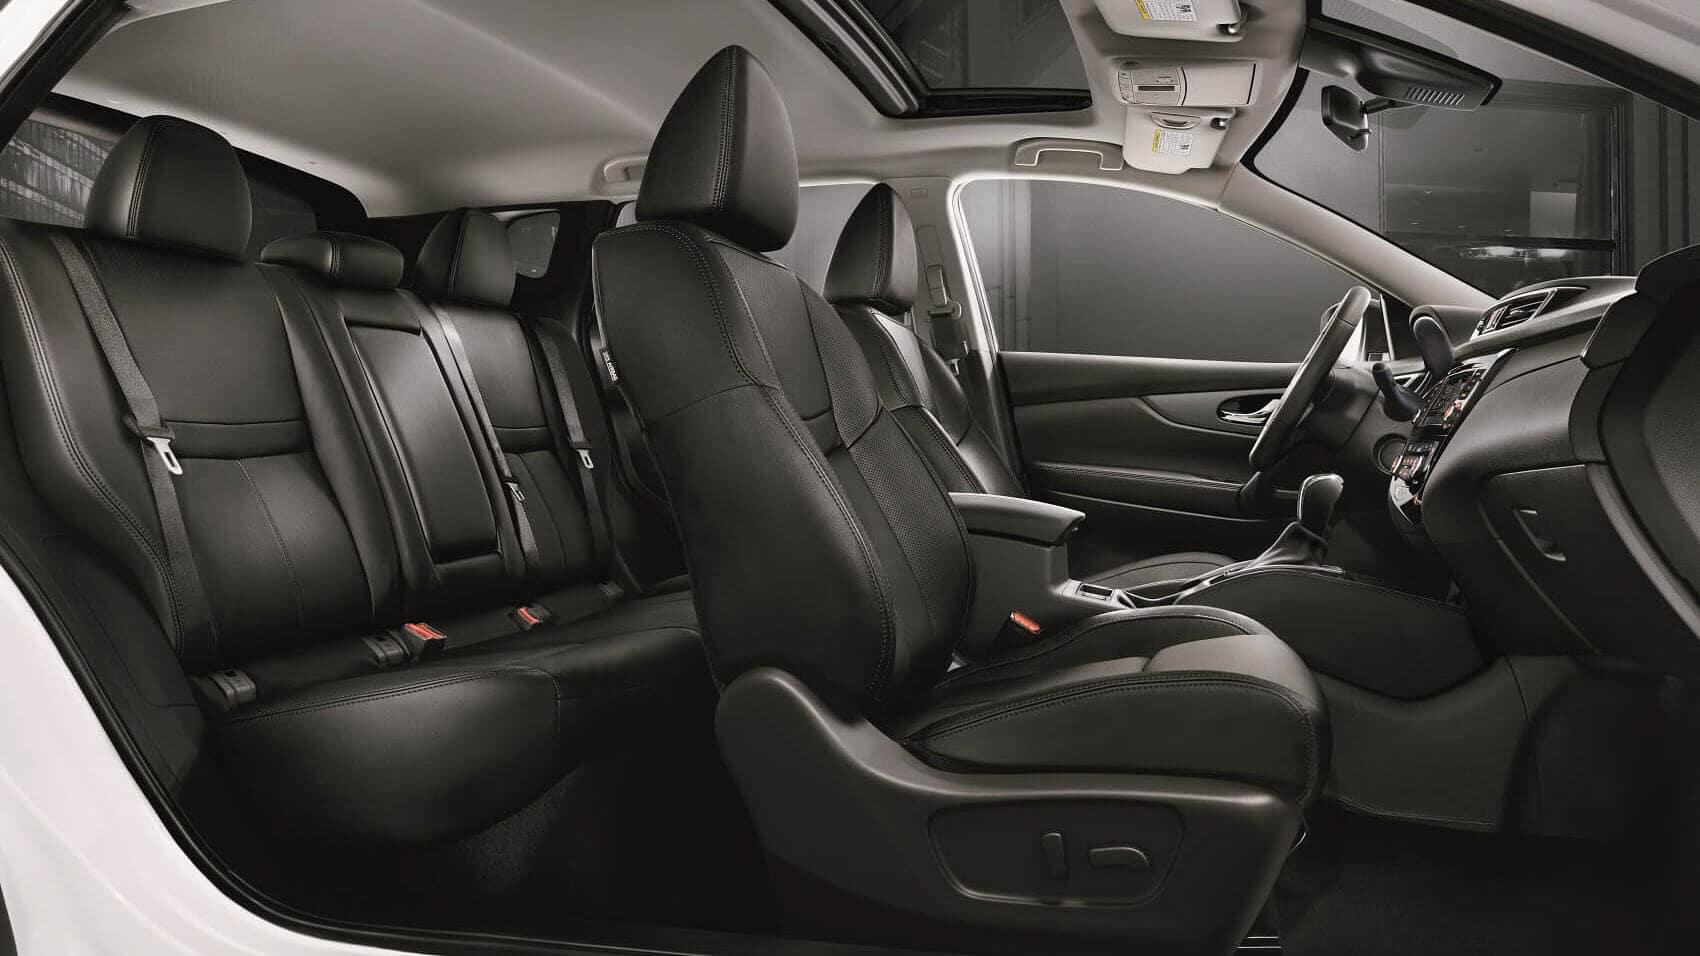 2020 Nissan Rogue Sport Interior Space